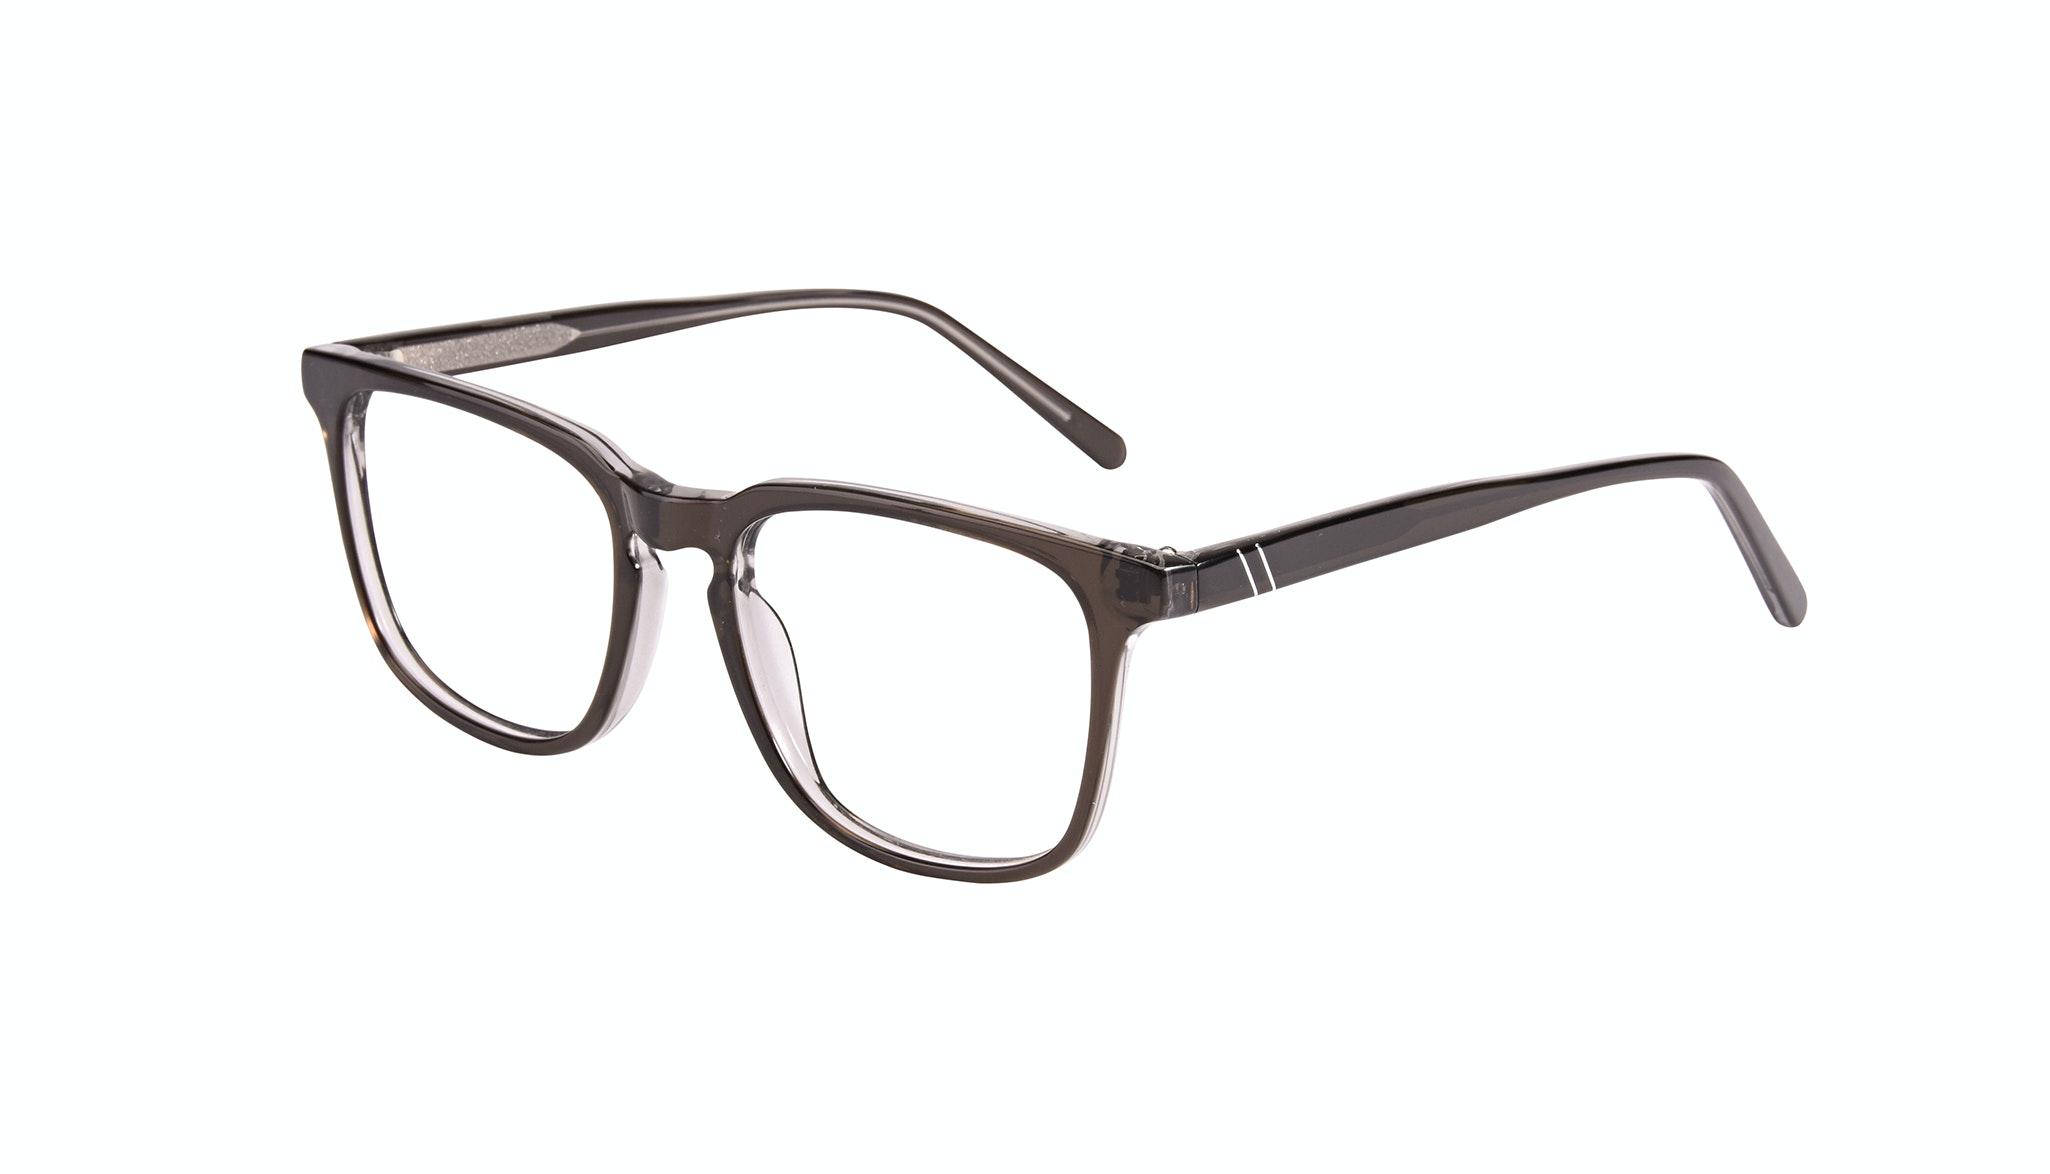 Affordable Fashion Glasses Rectangle Square Eyeglasses Men Peak Black Ice Tilt